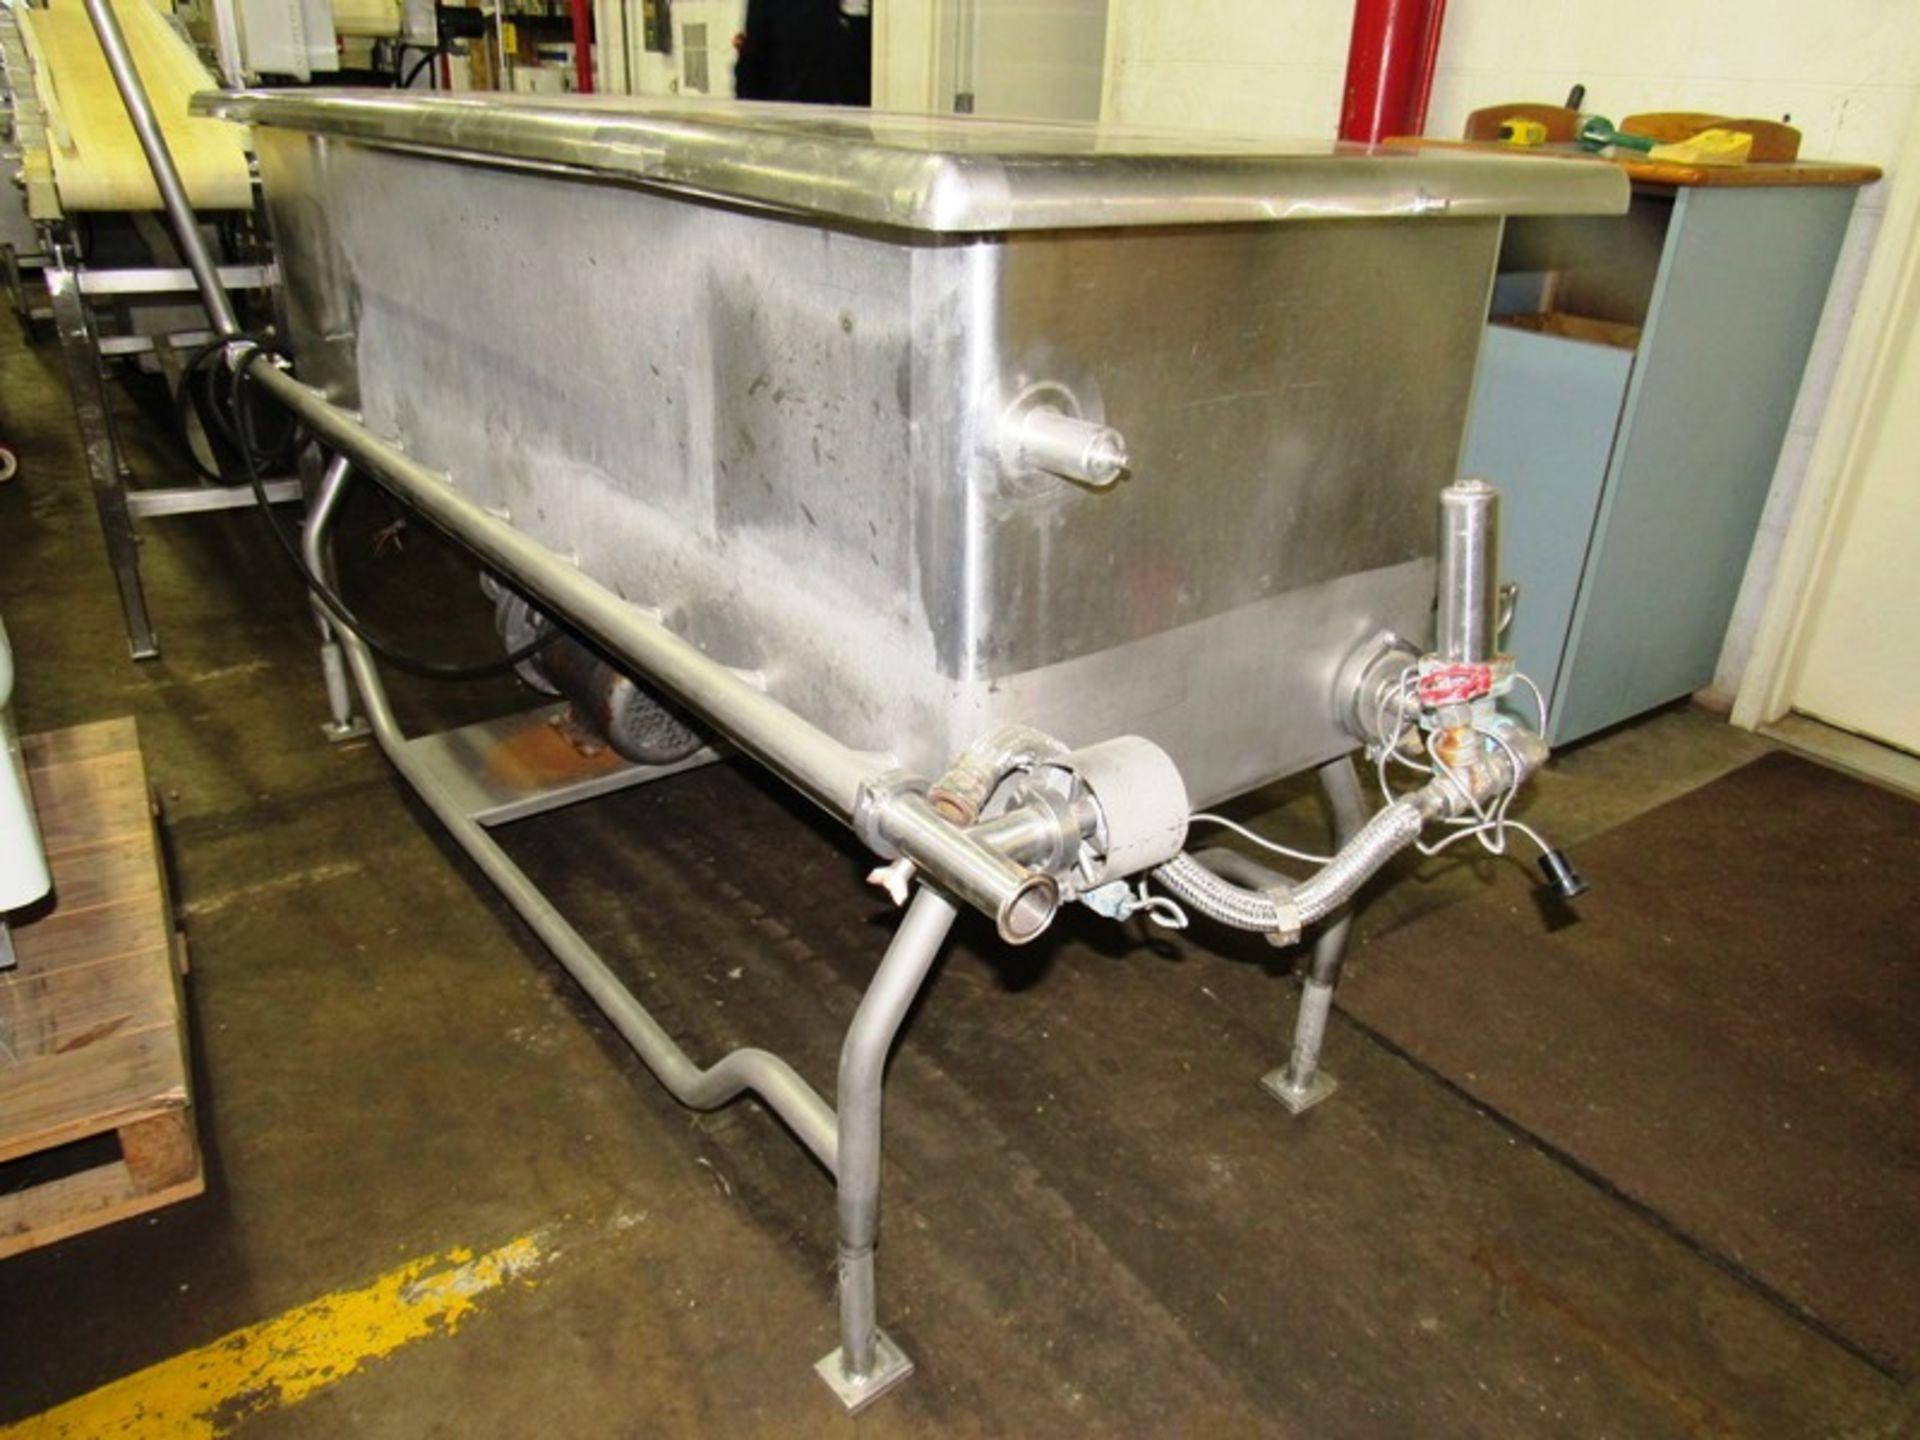 "Lot 23 - Sani-Matic Mdl. RJW-150 Stainless Steel COP Tank, 24"" W X 74"" L X 21"" D, 9 sprayers each side,"